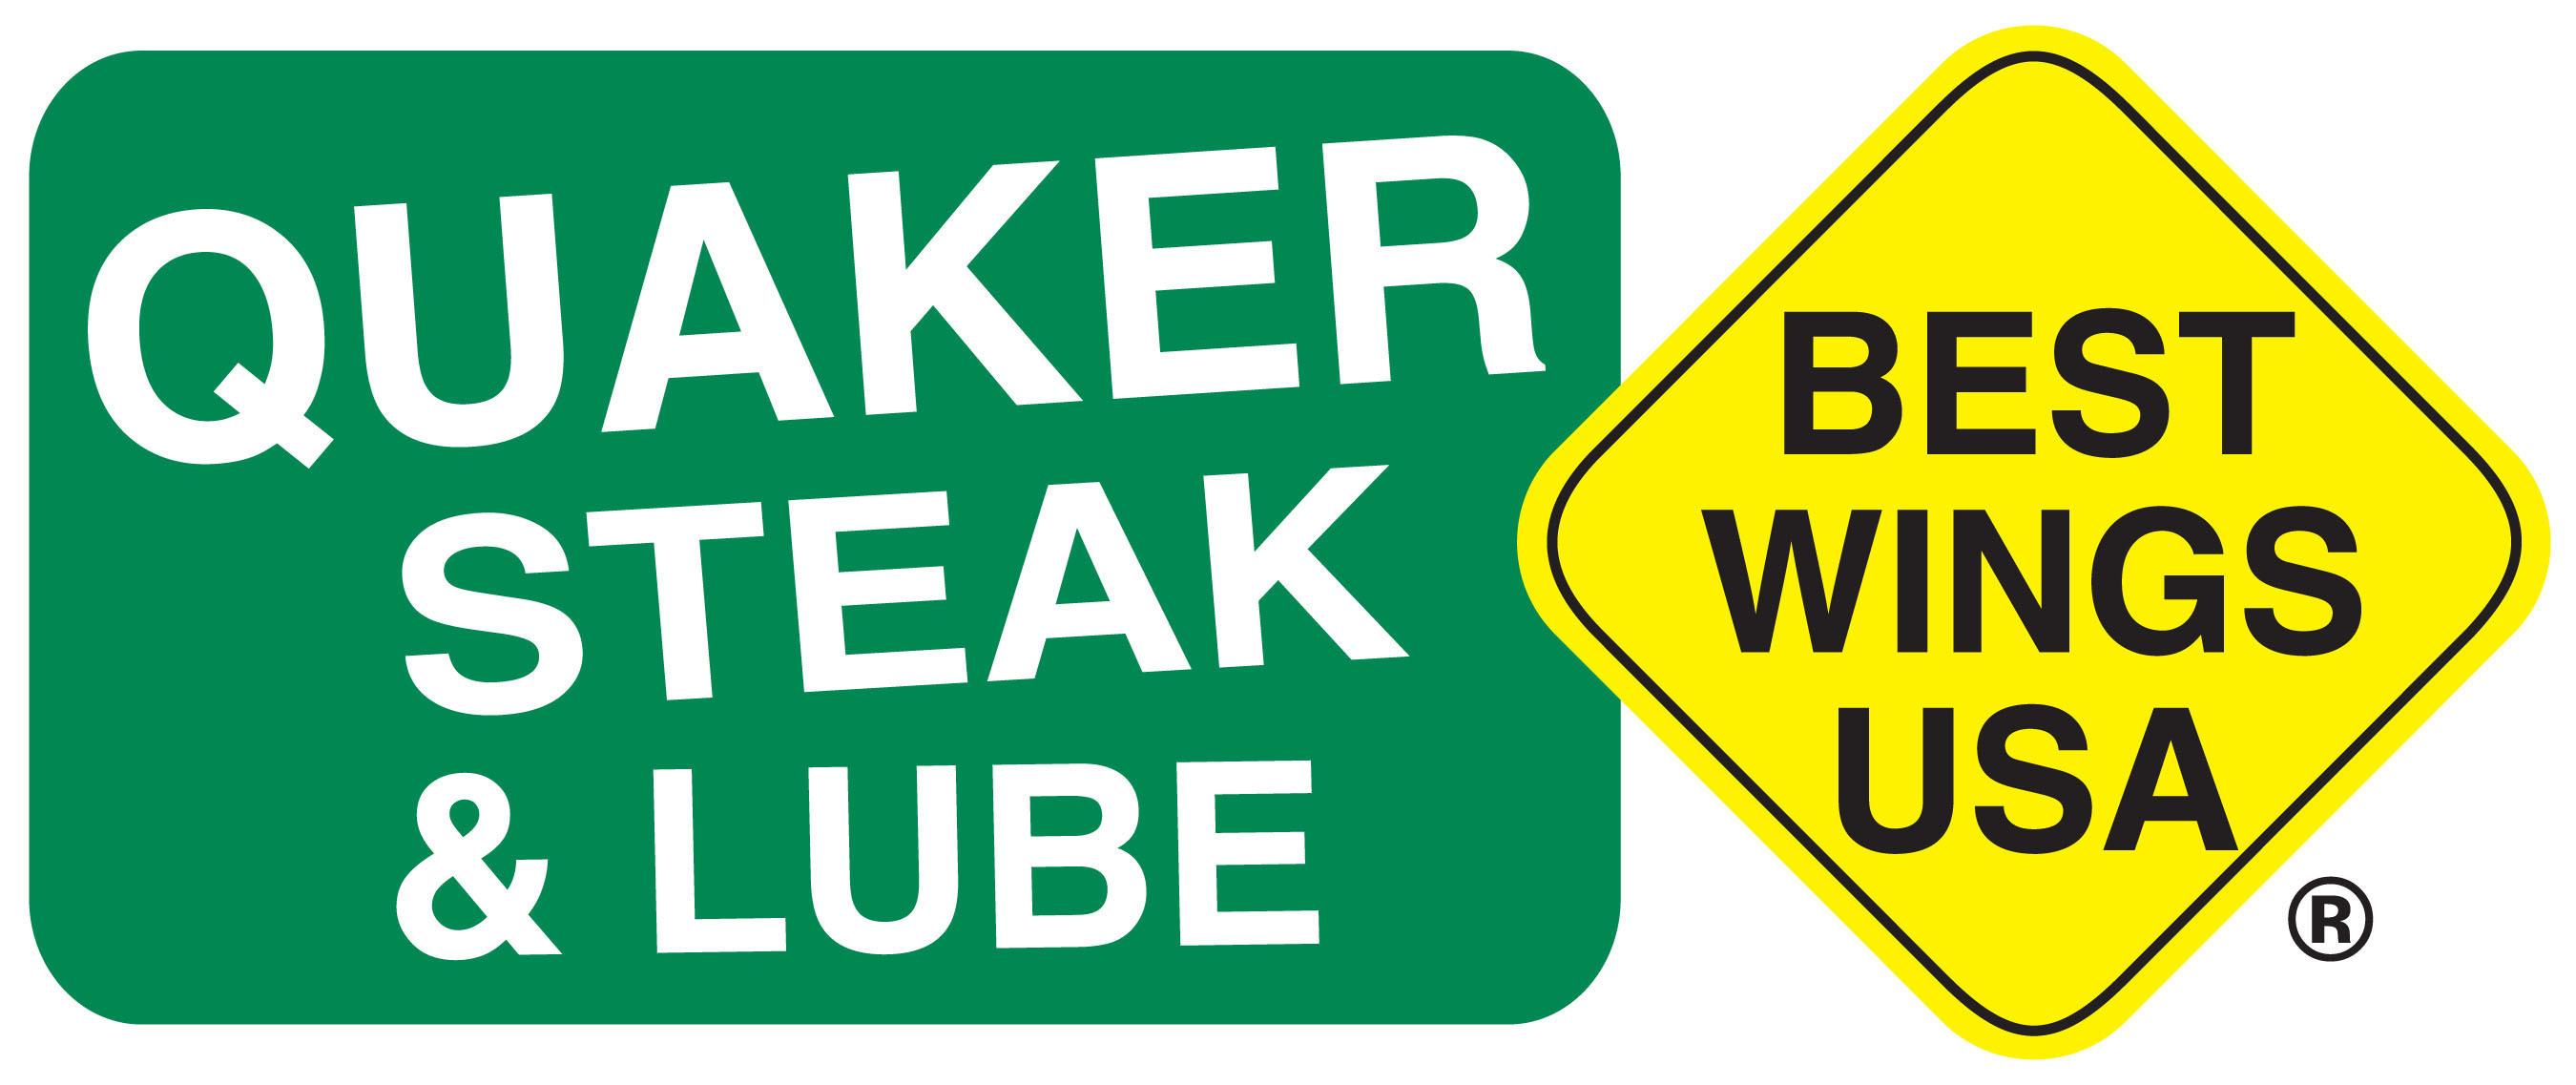 Quaker Steak & Lube company logo.